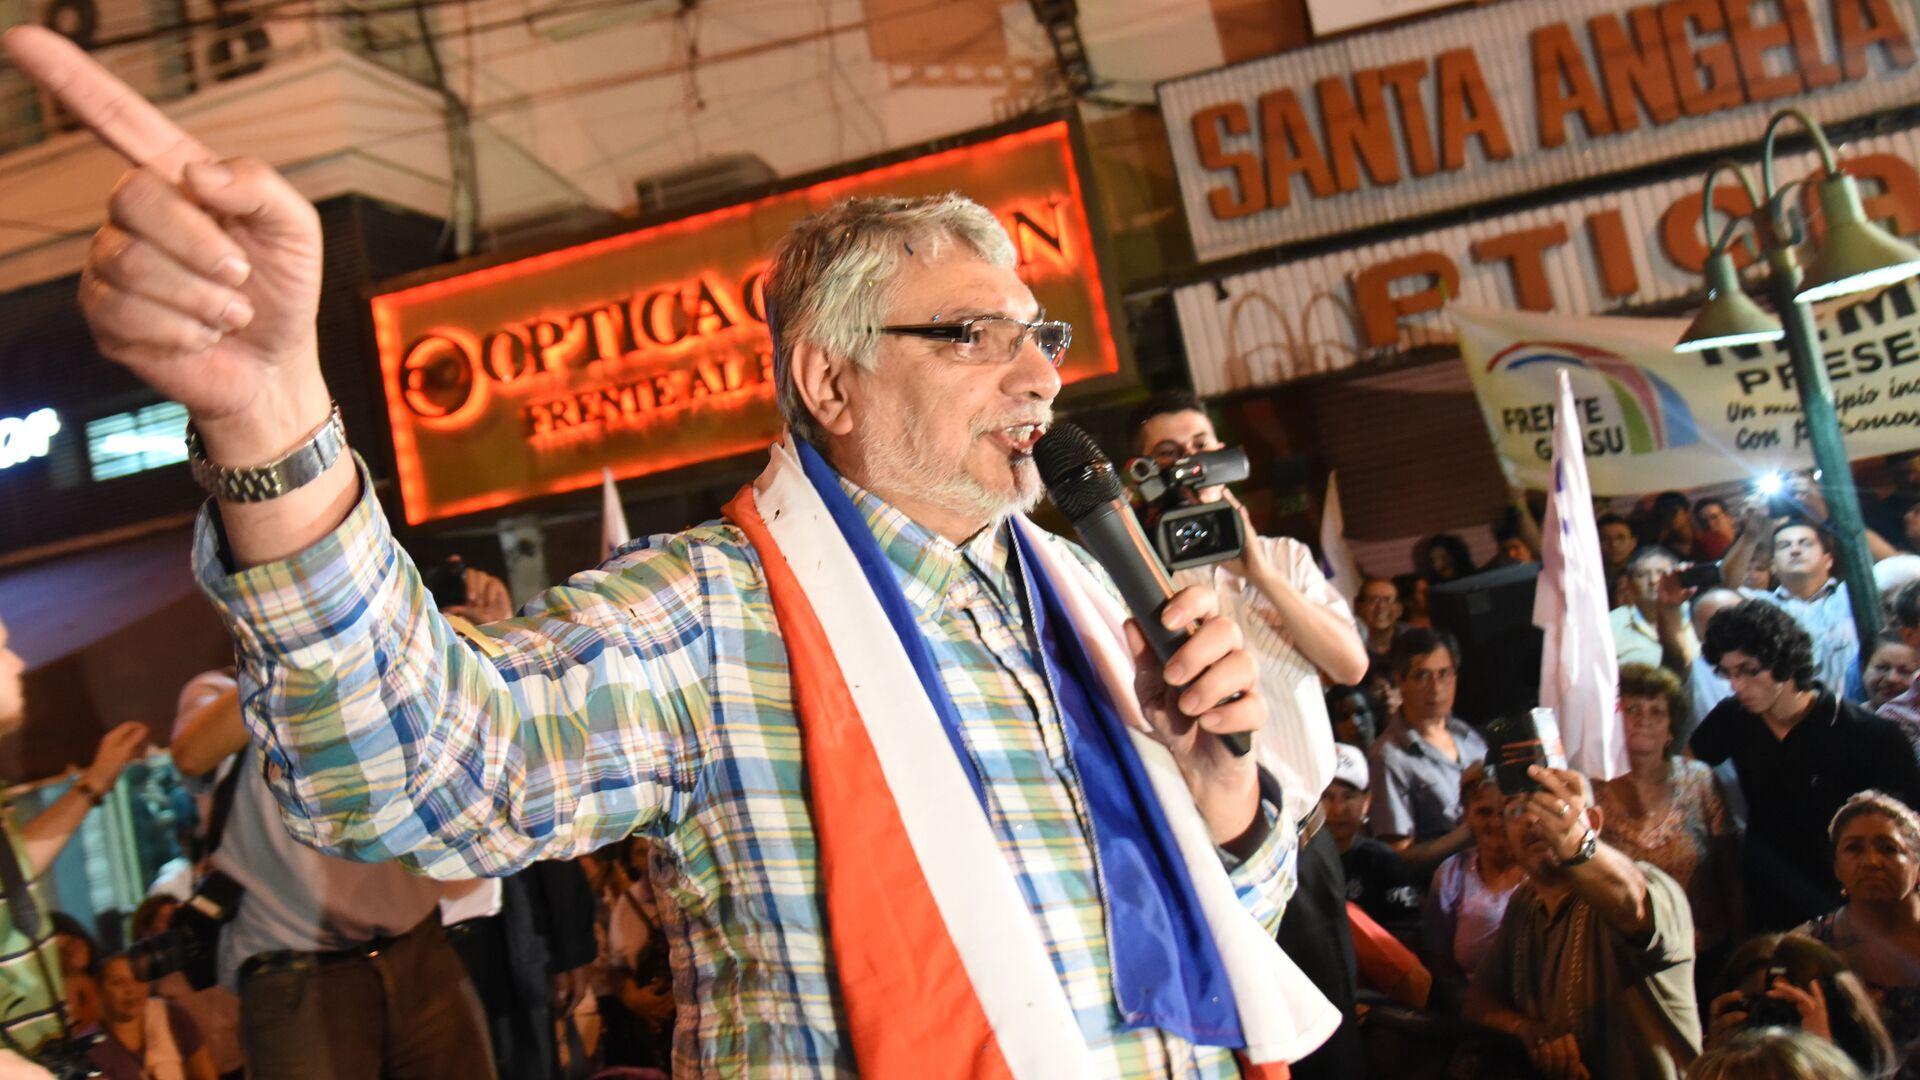 Former Paraguayan president and current senator Fernando Lugo speaks during a political rally in Asuncion on August 7, 2015 - Sputnik Mundo, 1920, 31.05.2021